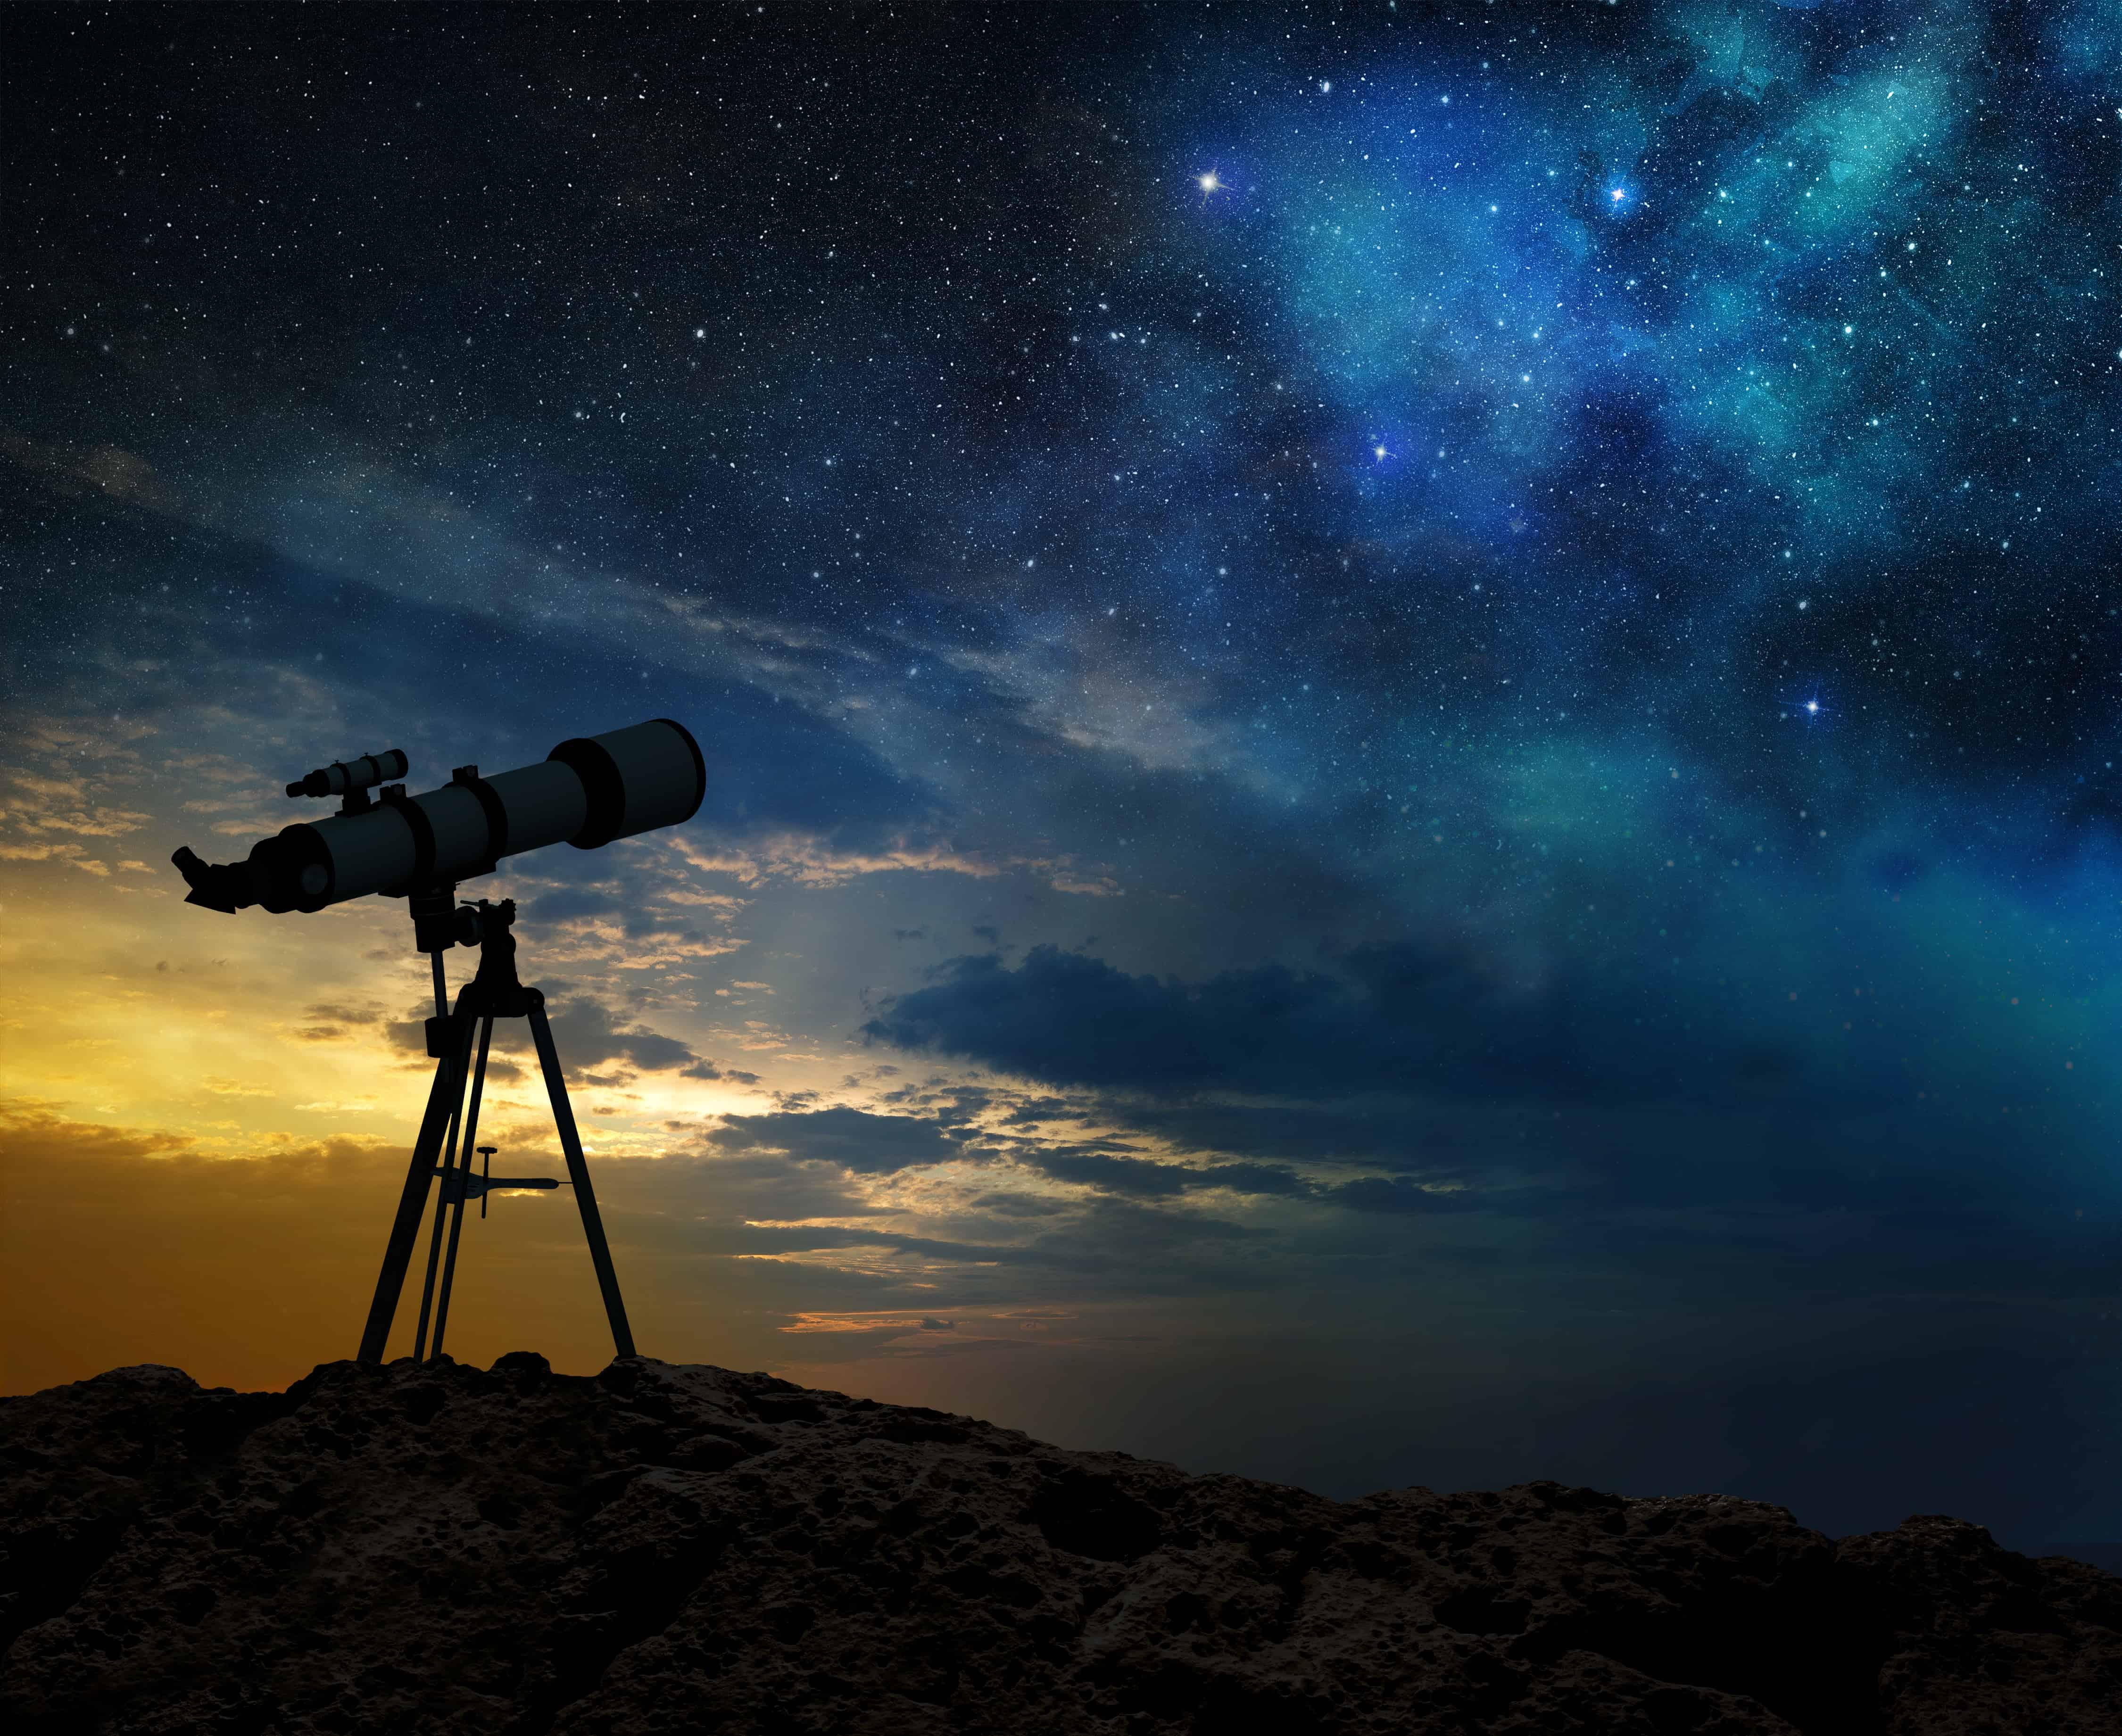 Teleskop für kinder edu science u ac bärnbach